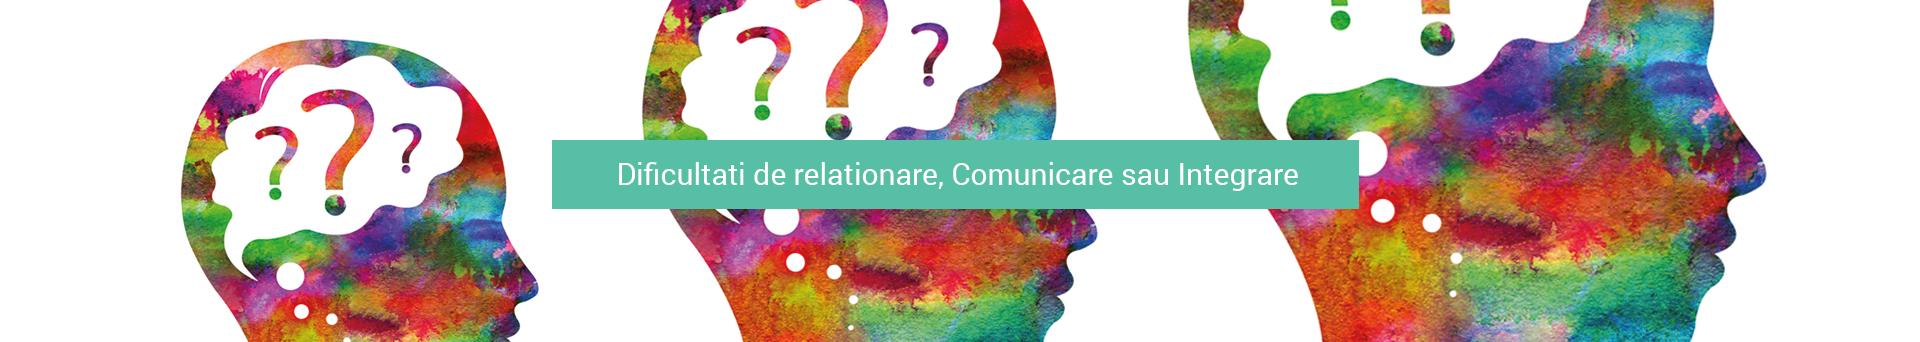 Dificultati de relationare, Comunicare sau Integrare